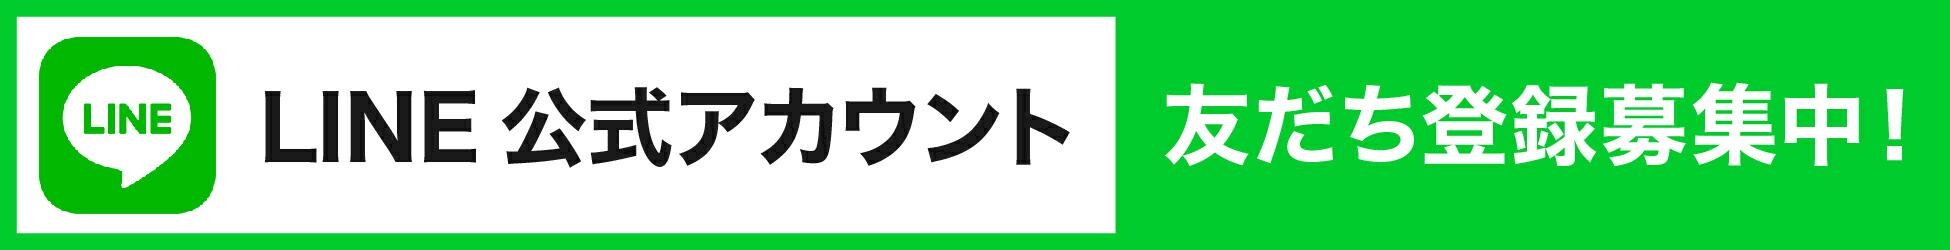 NAMASHEA(ナマシア)LINE公式アカウント